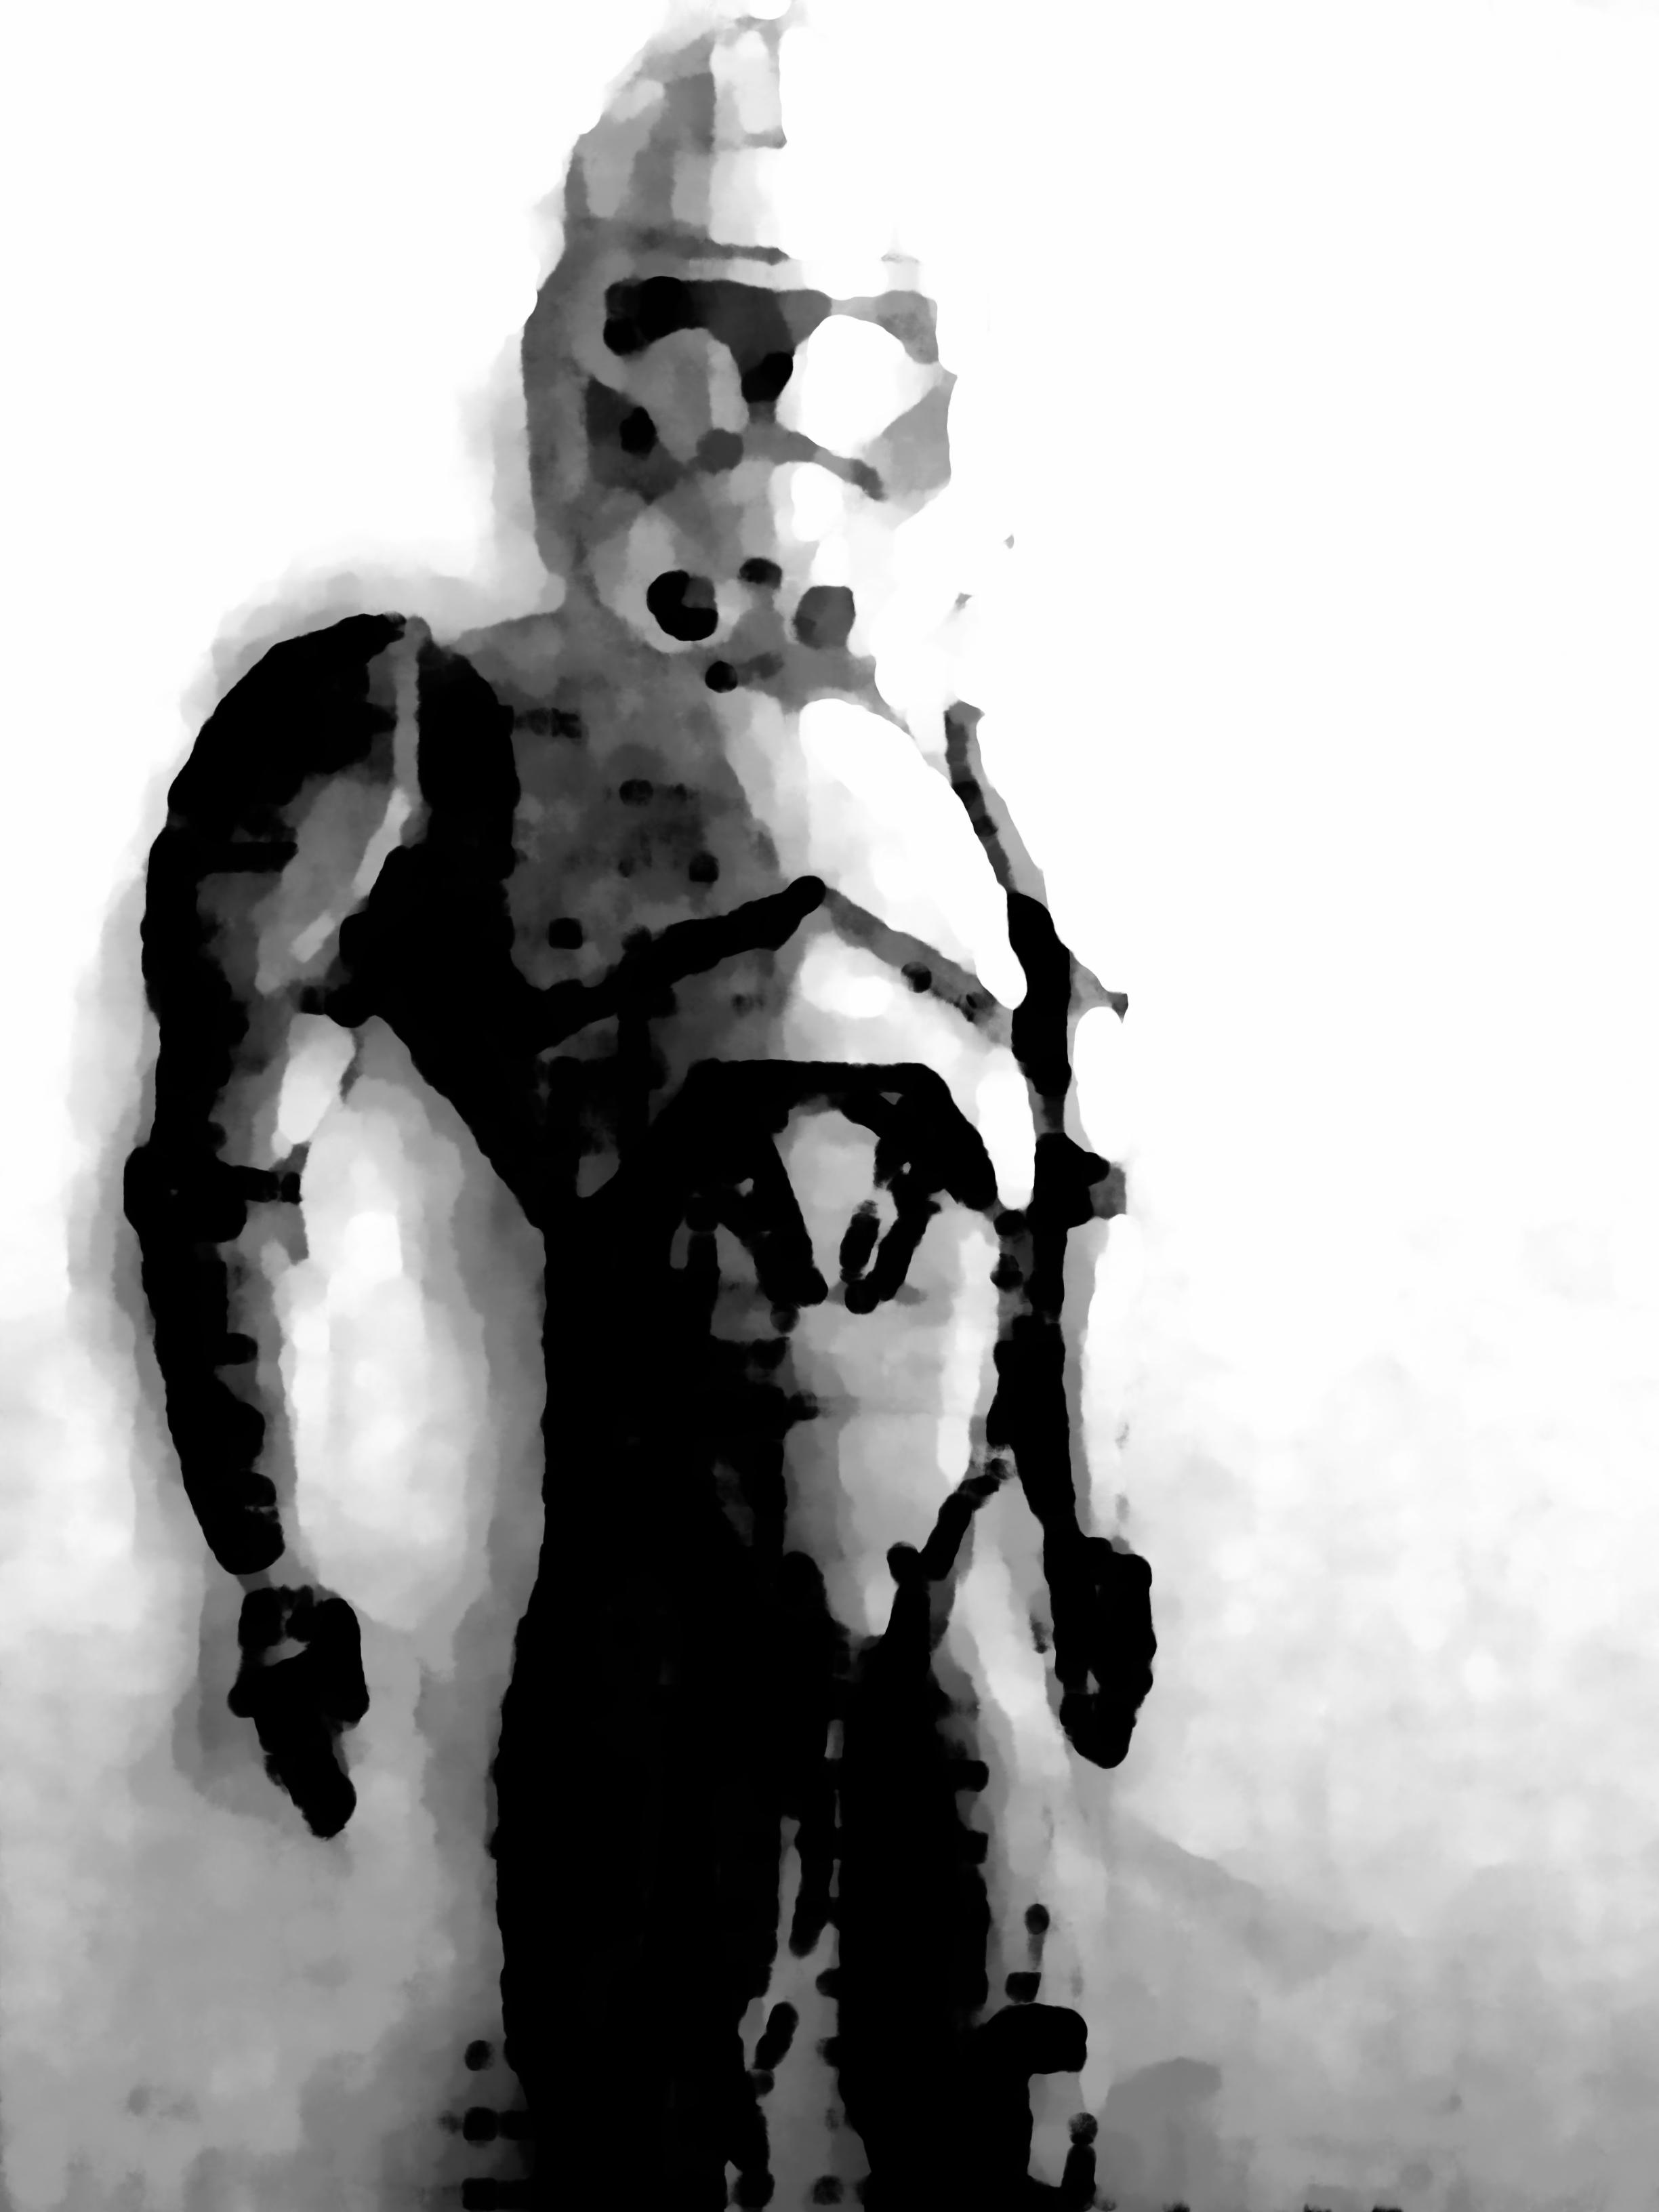 Clone Trooper Mobile Wallpaper By Bsm9199 On Deviantart